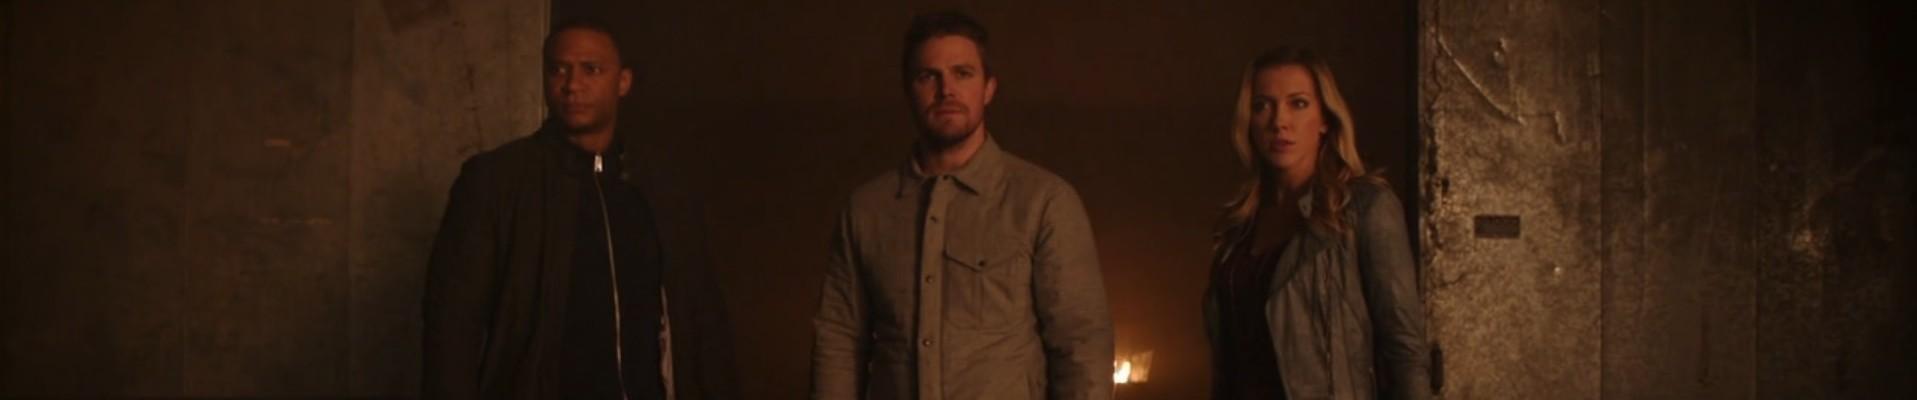 Arrow S04E13